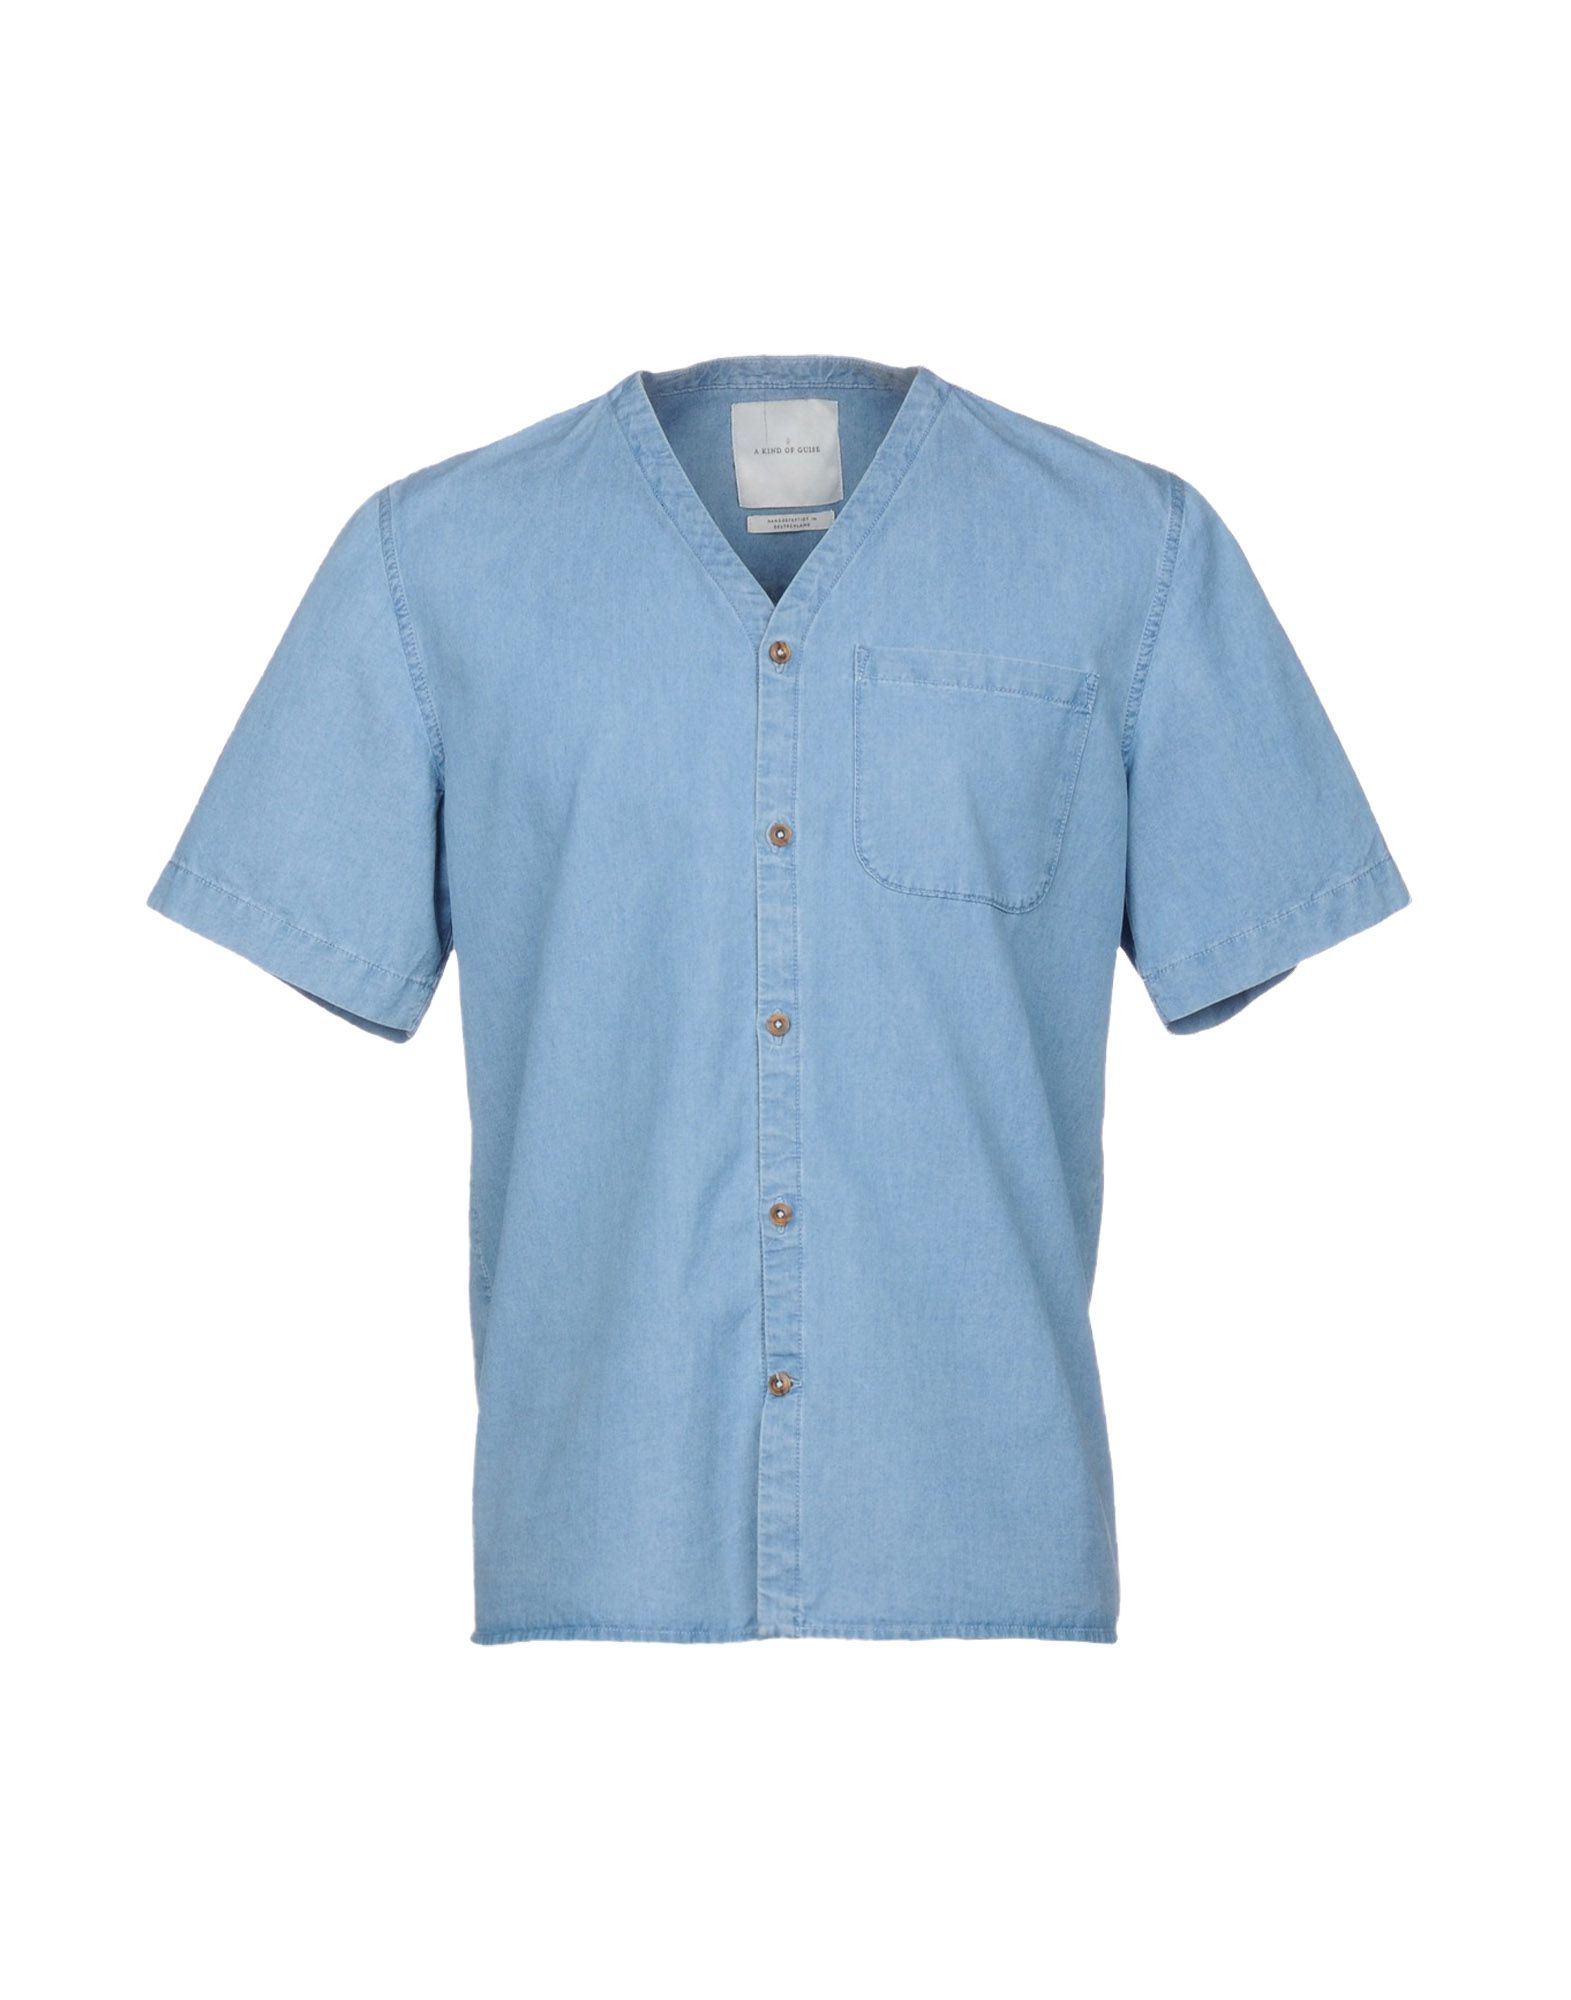 все цены на A KIND OF GUISE Джинсовая рубашка онлайн